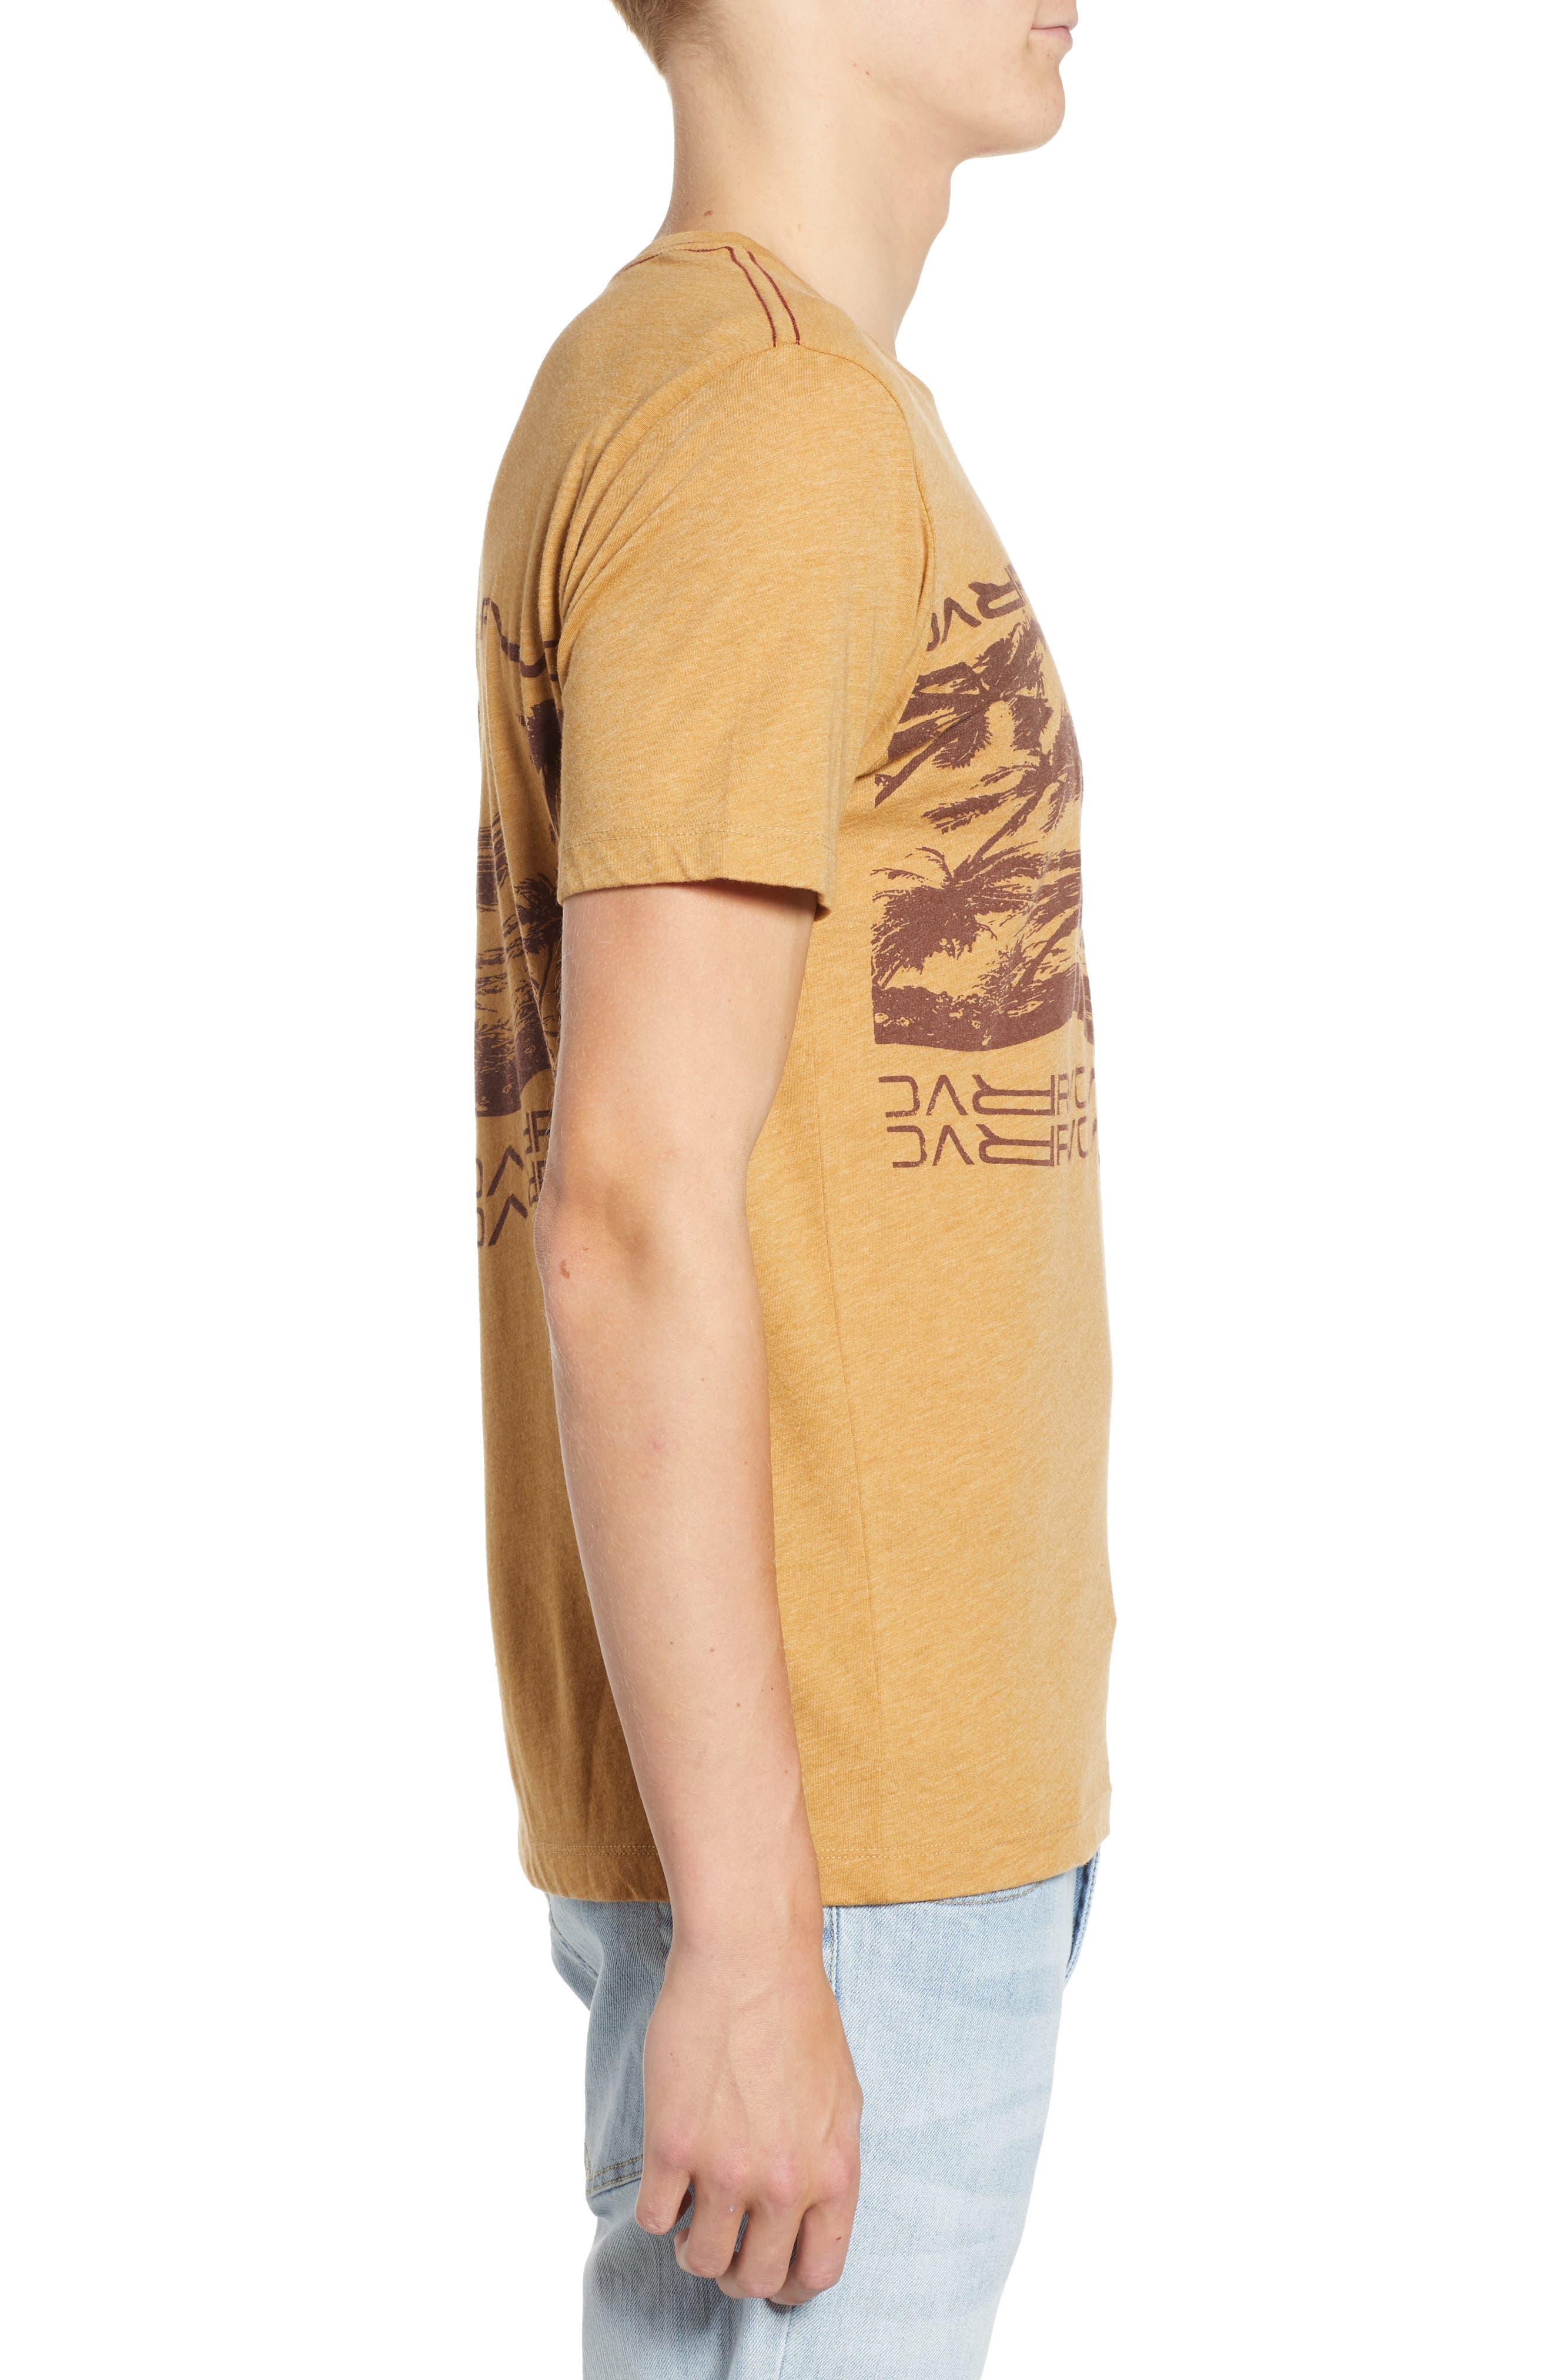 Warped Palm Graphic T-Shirt,                             Alternate thumbnail 3, color,                             700